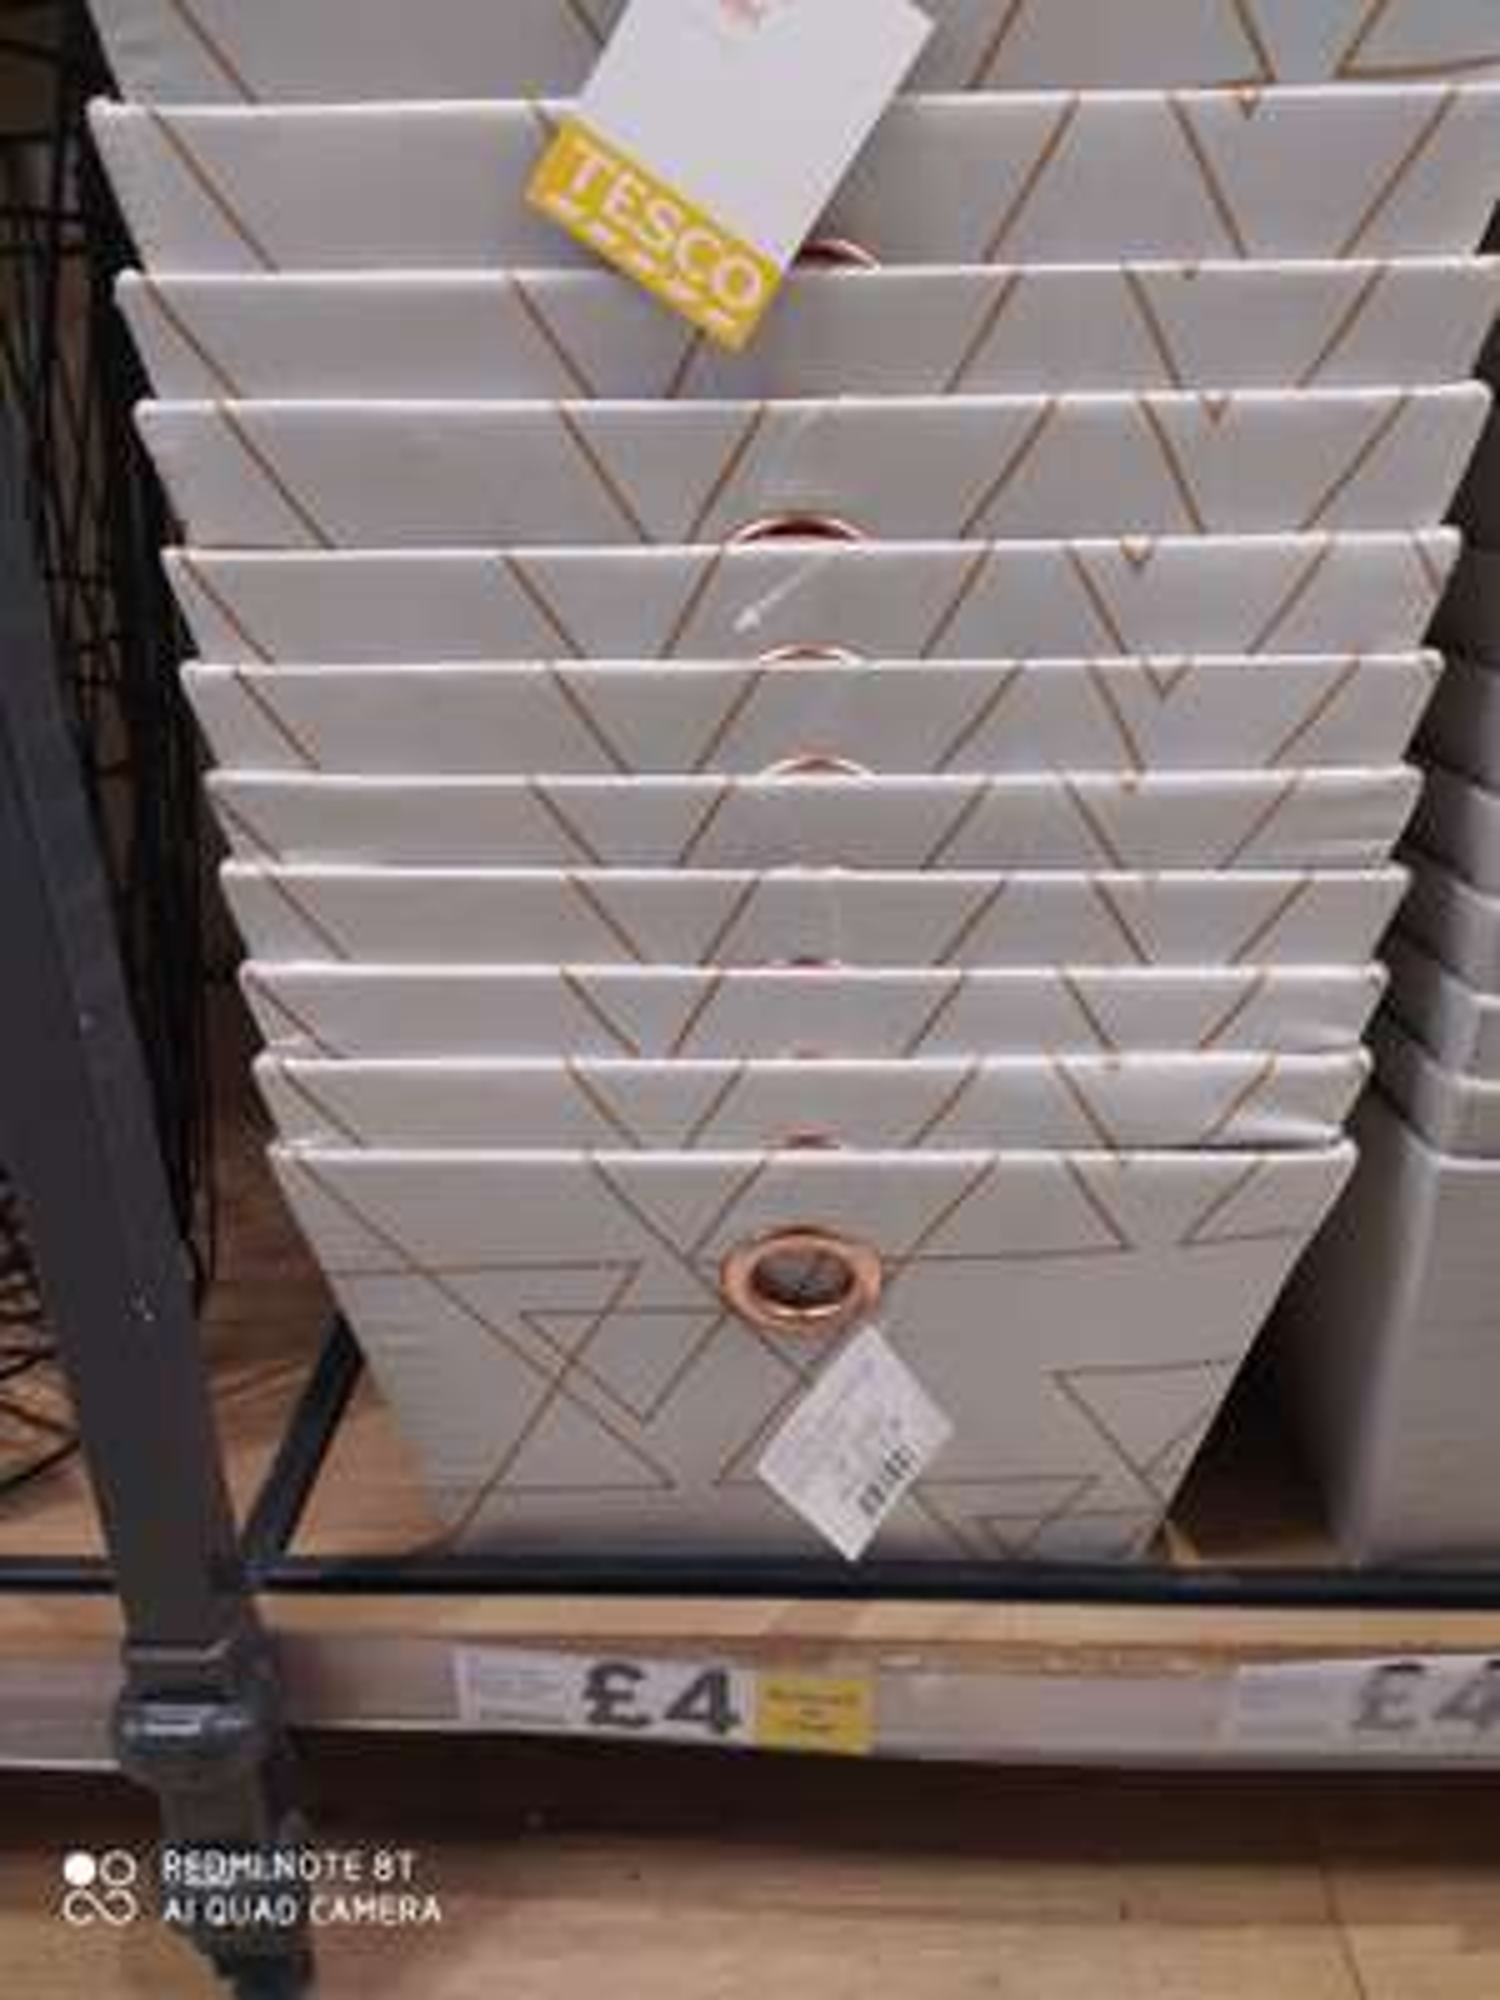 Large woven storage basket in Tesco Batley branch for £4